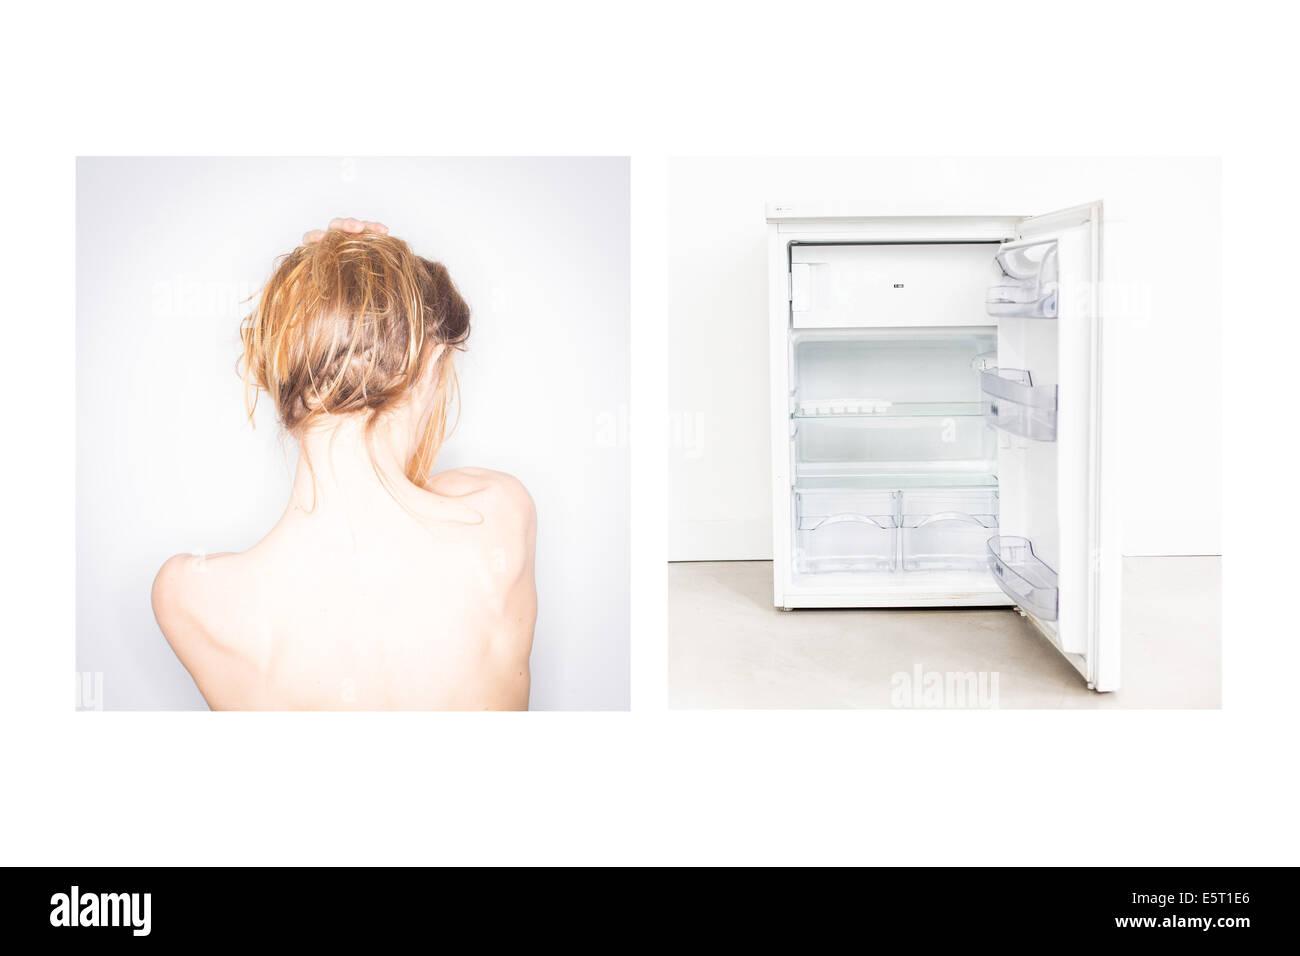 Concepto de la Anorexia. Foto de stock